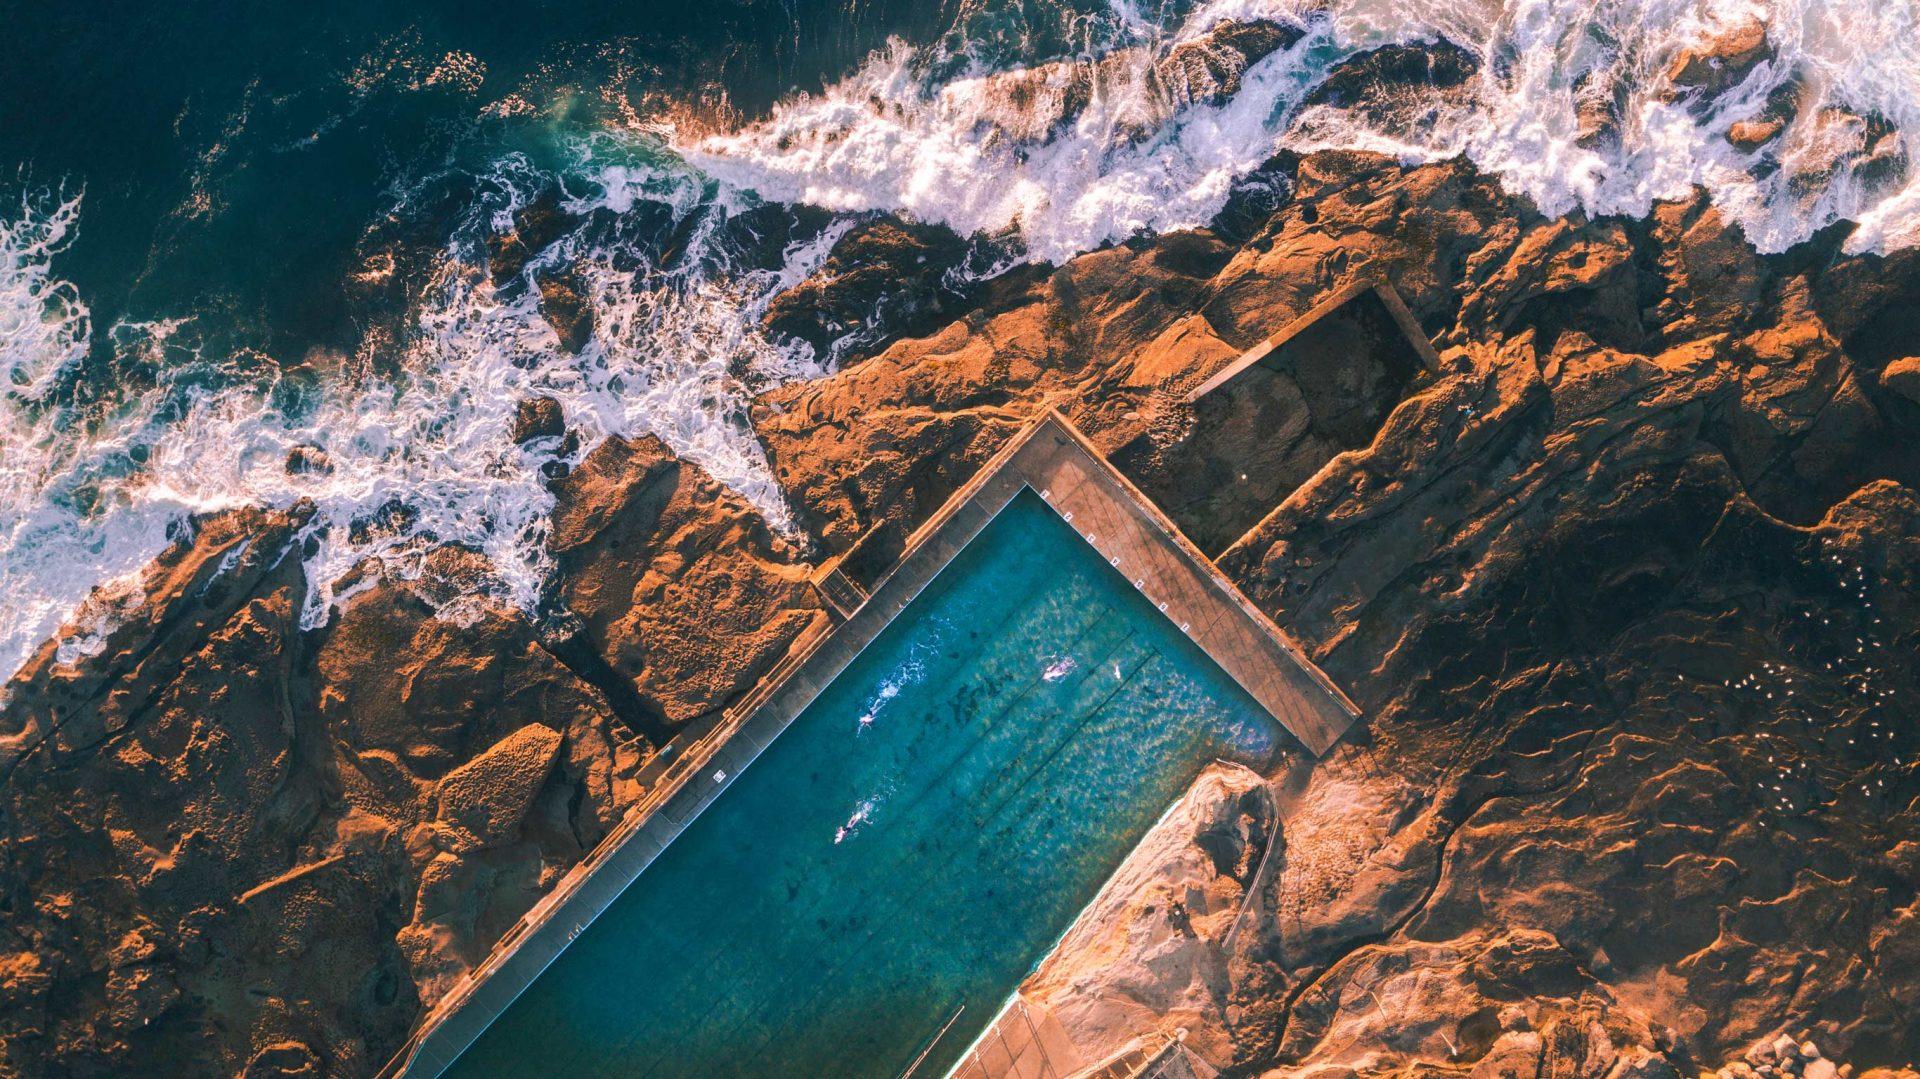 piscinas_placeres_visavis_destacada